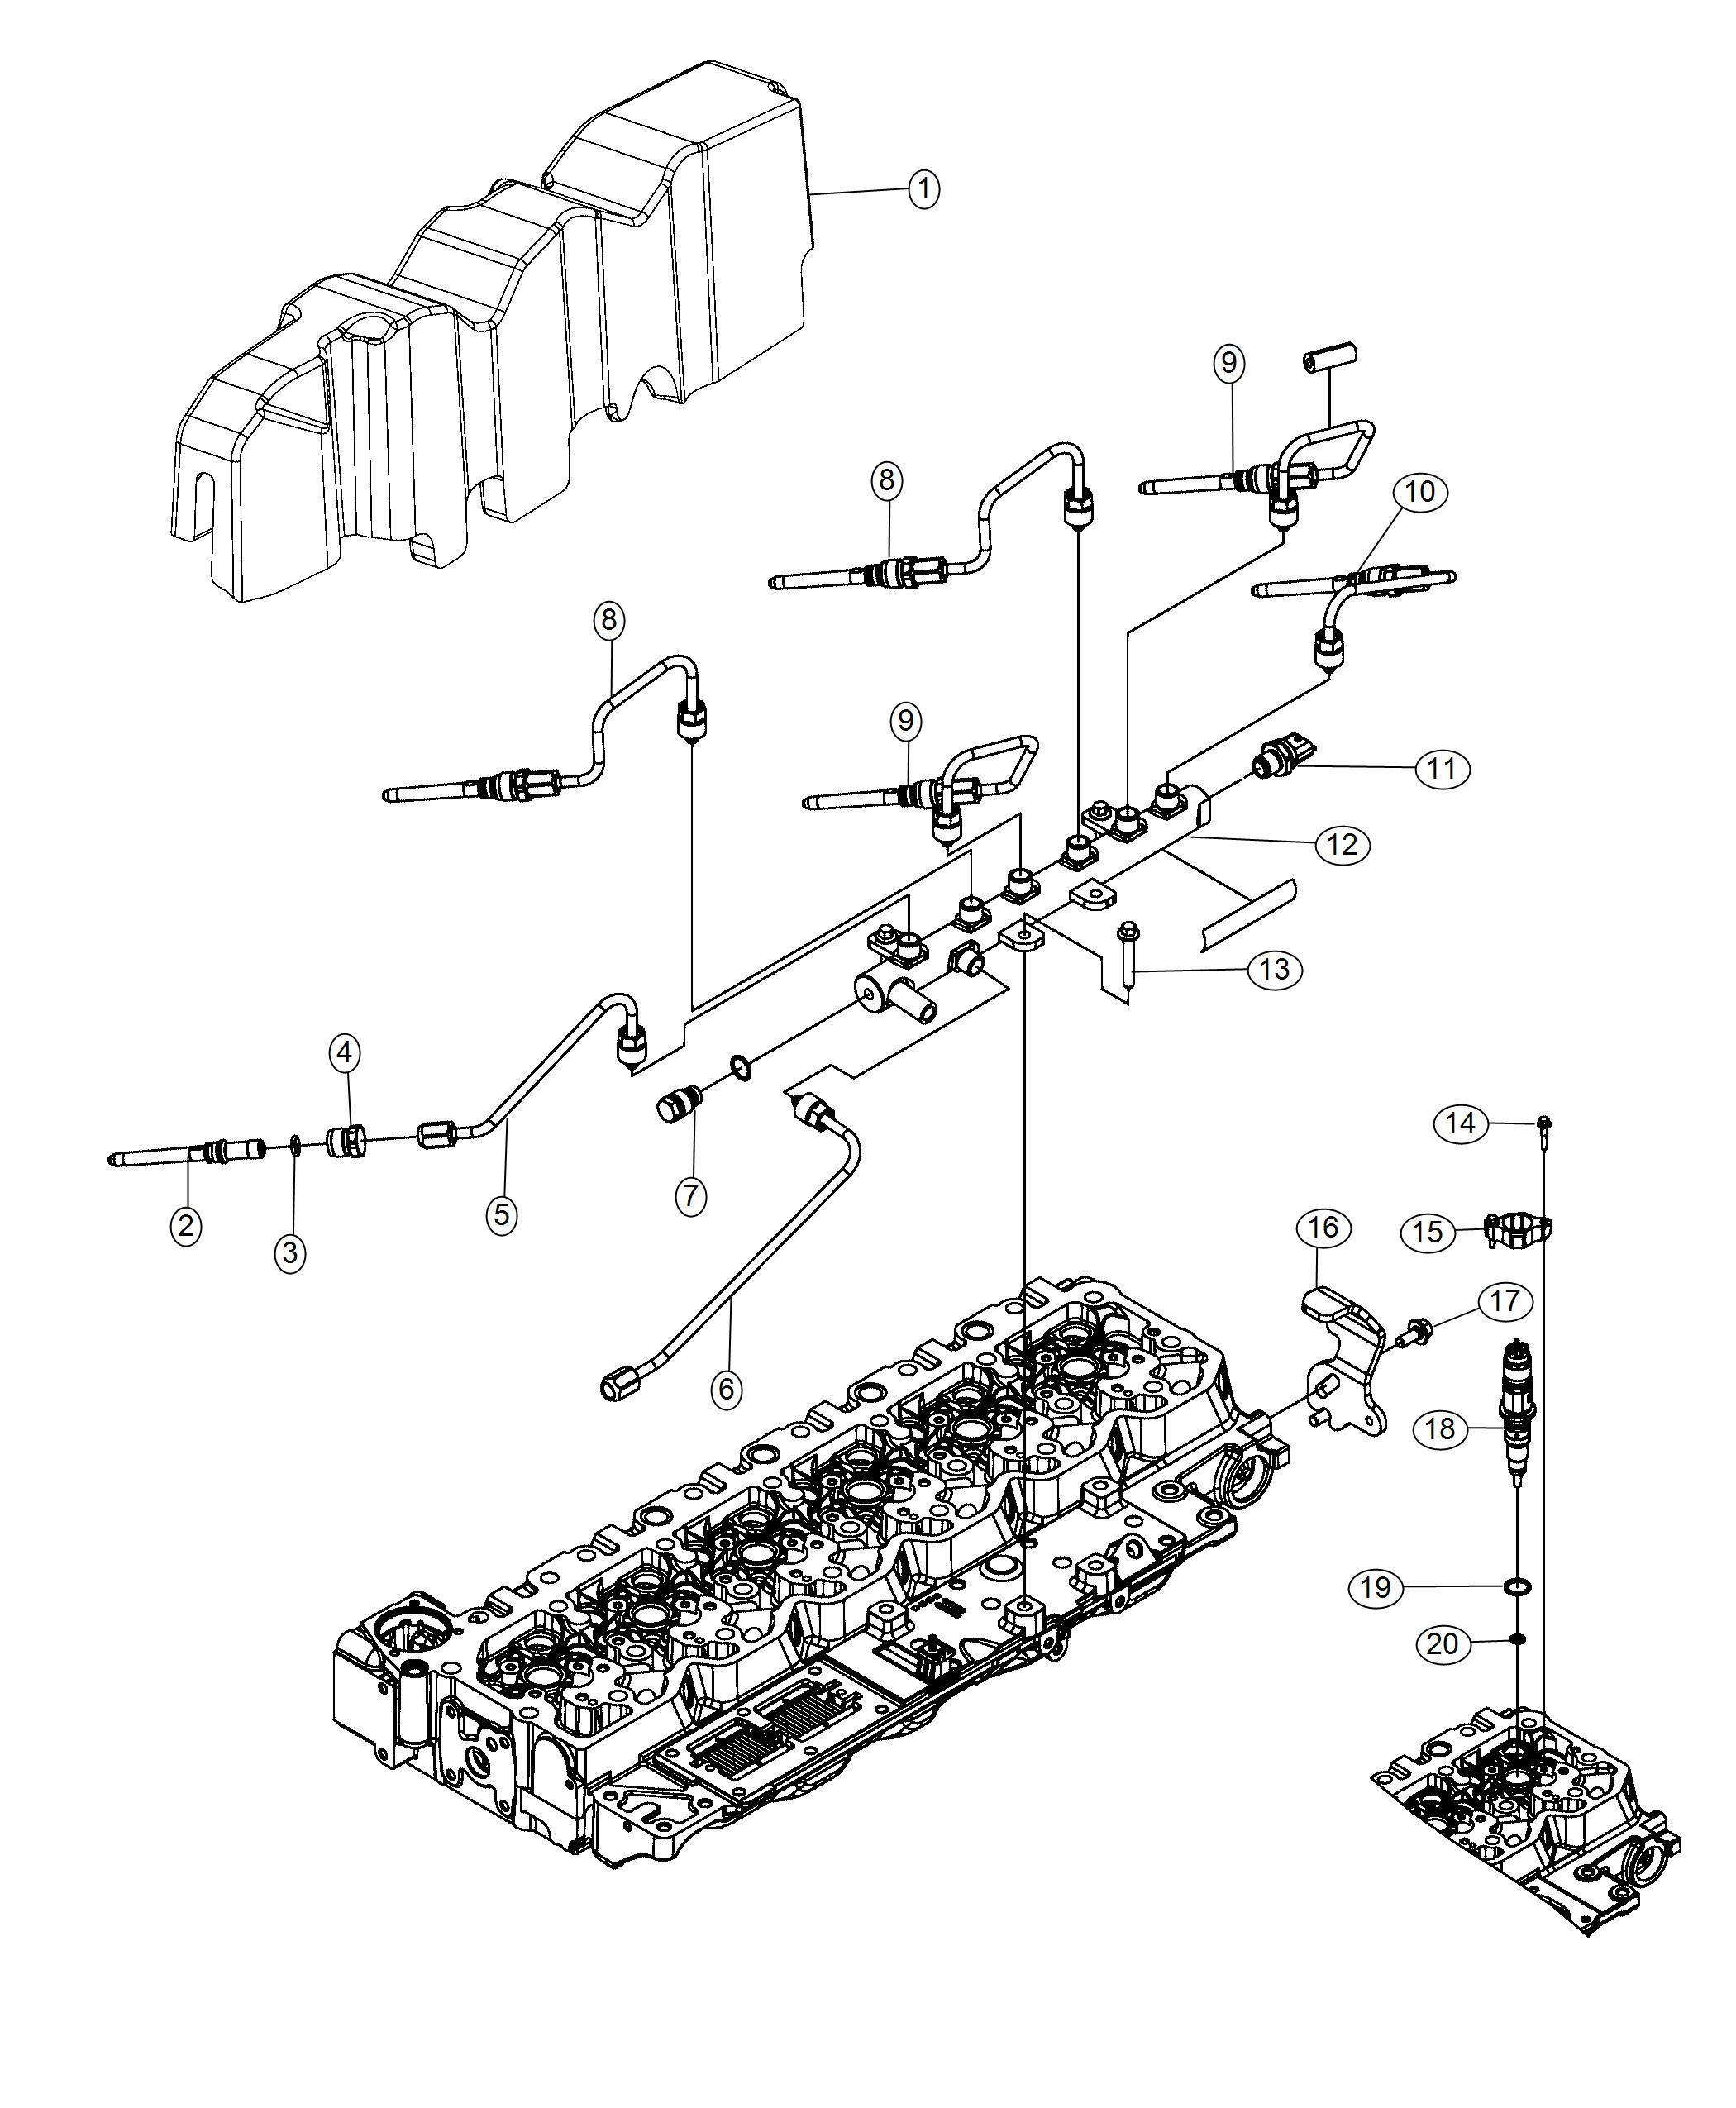 Ram Injector Fuel Emissions Export Underground